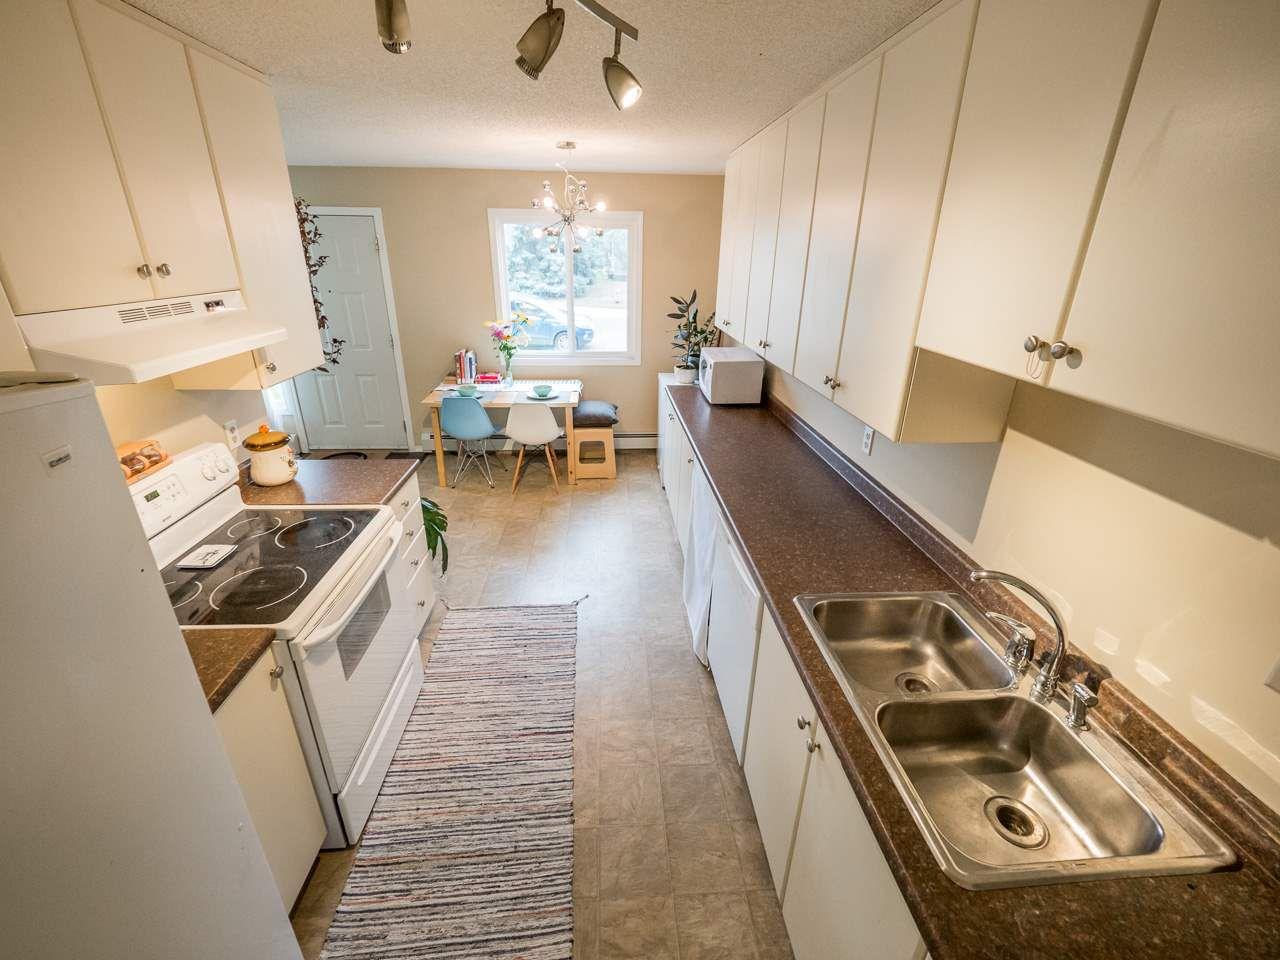 Main Photo: 119 6103 35A Avenue in Edmonton: Zone 29 Townhouse for sale : MLS®# E4135131